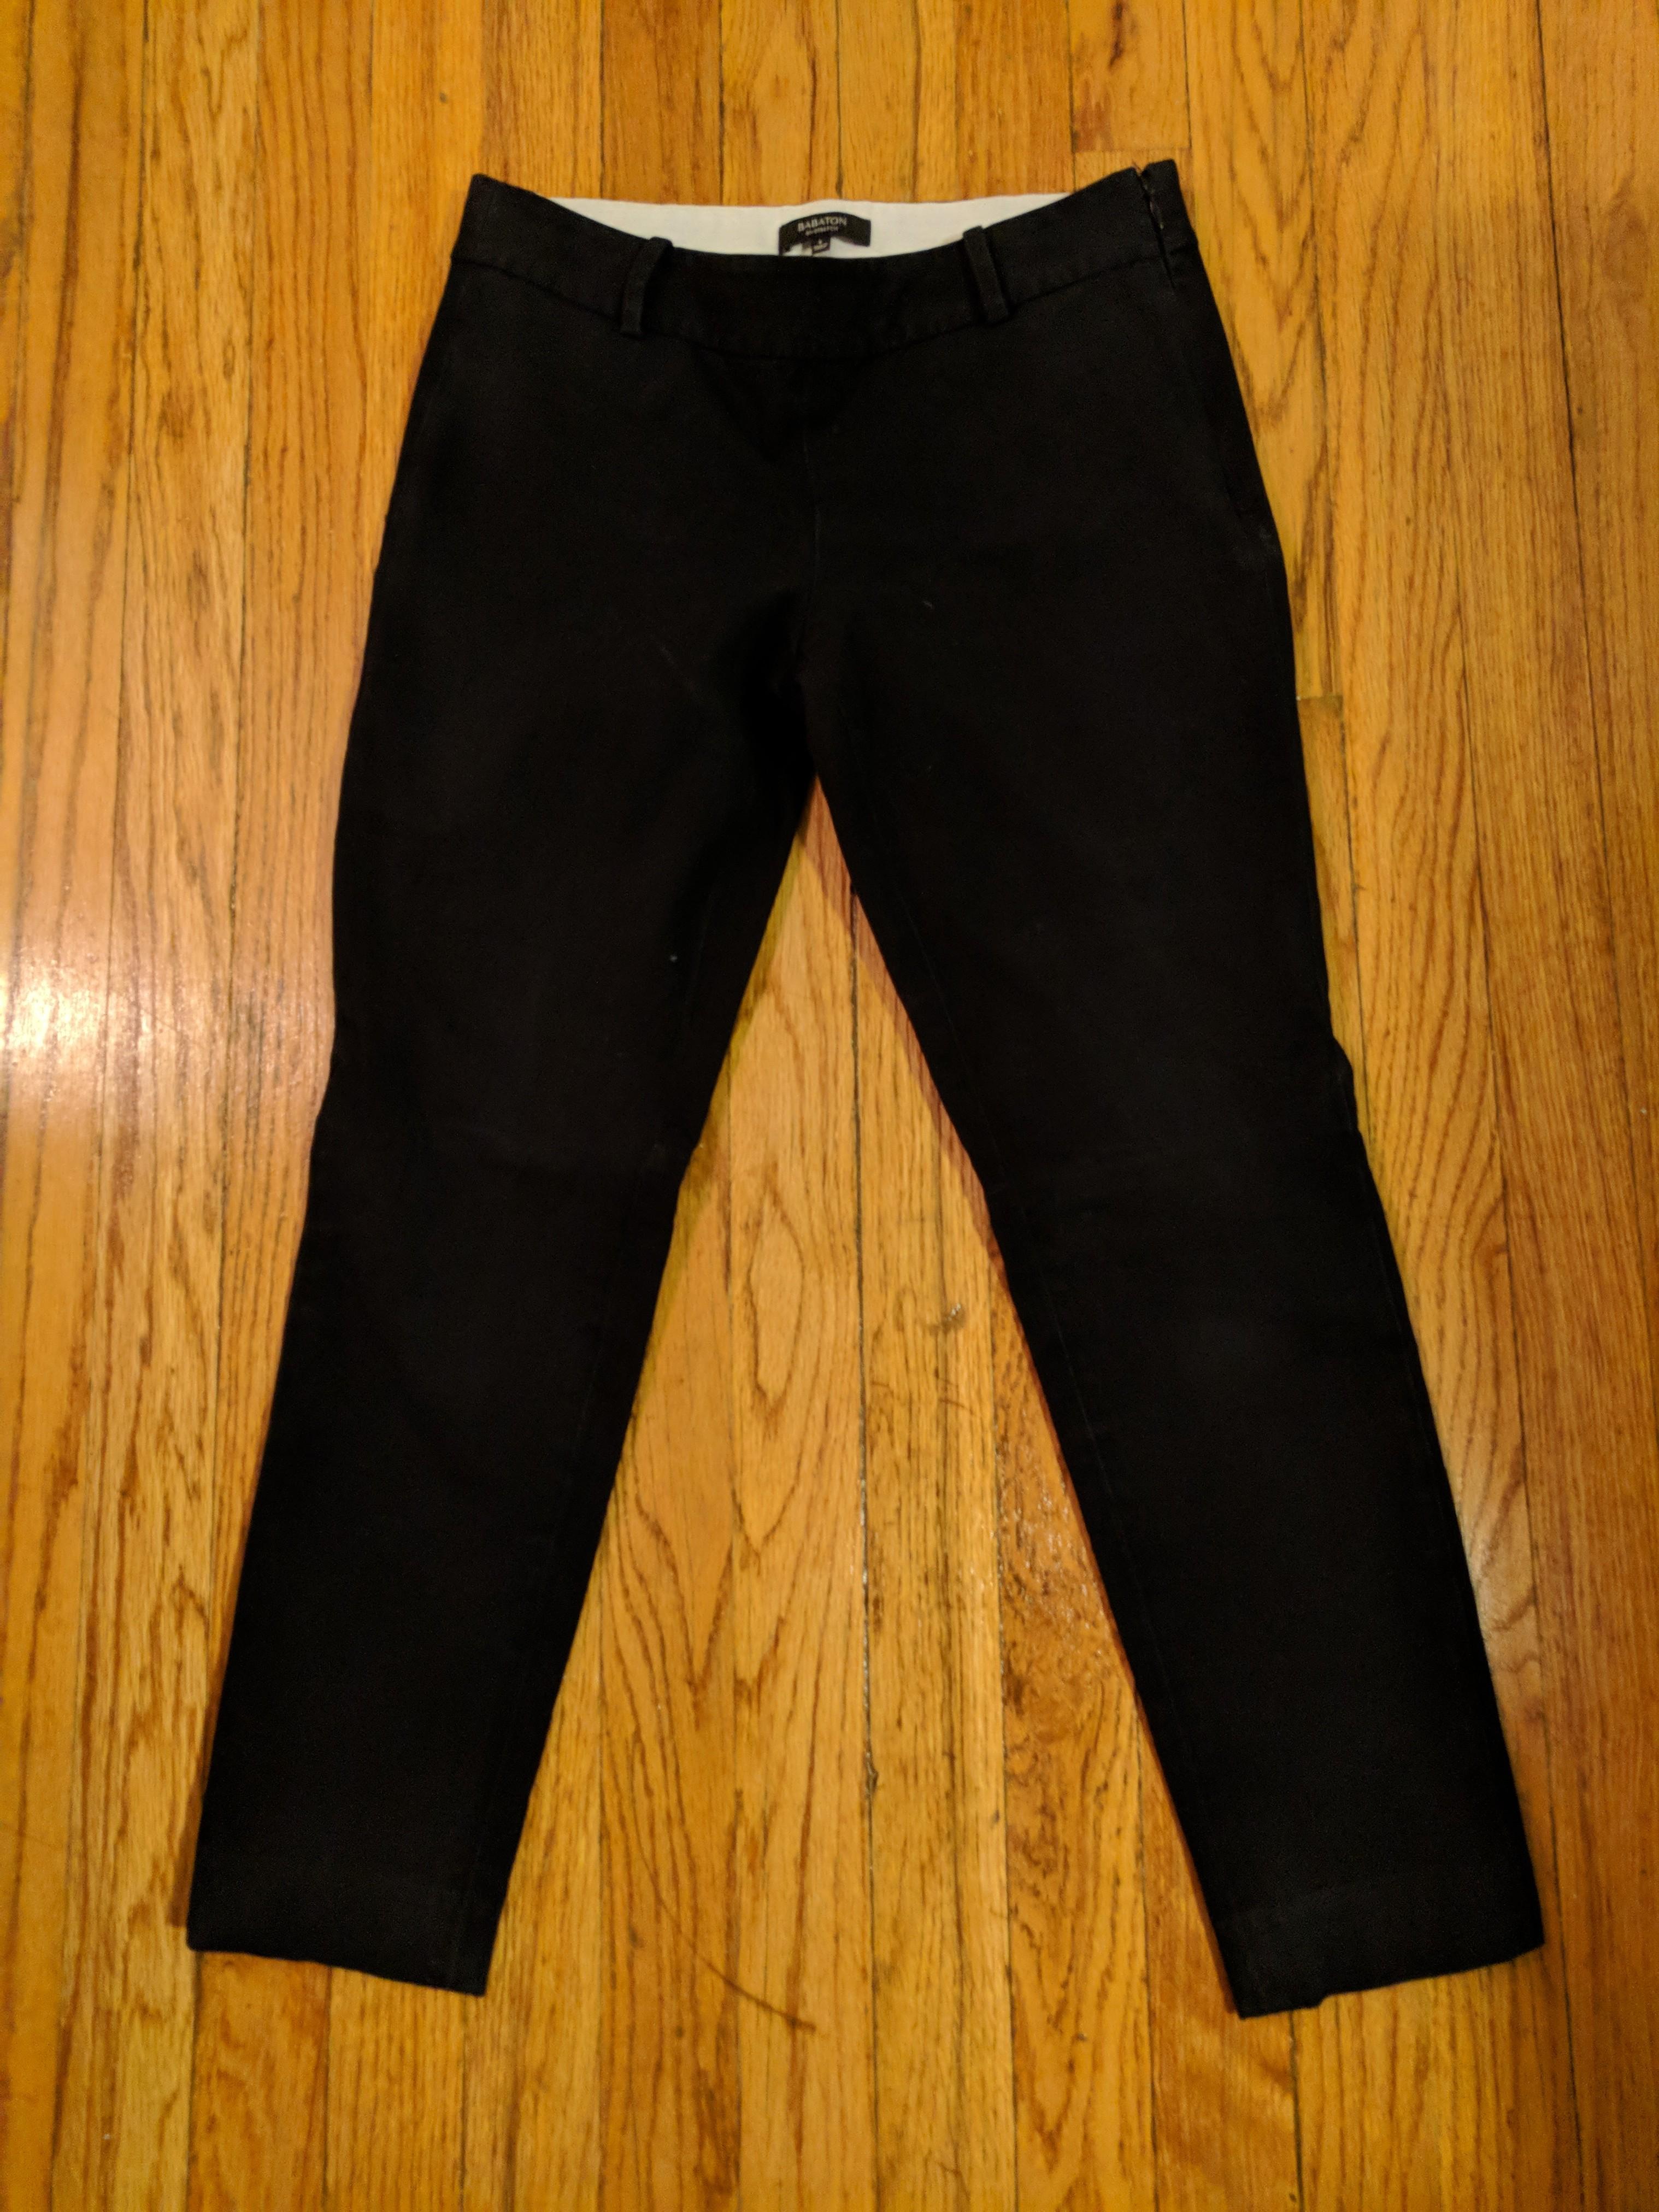 Babaton Elliott pants in black